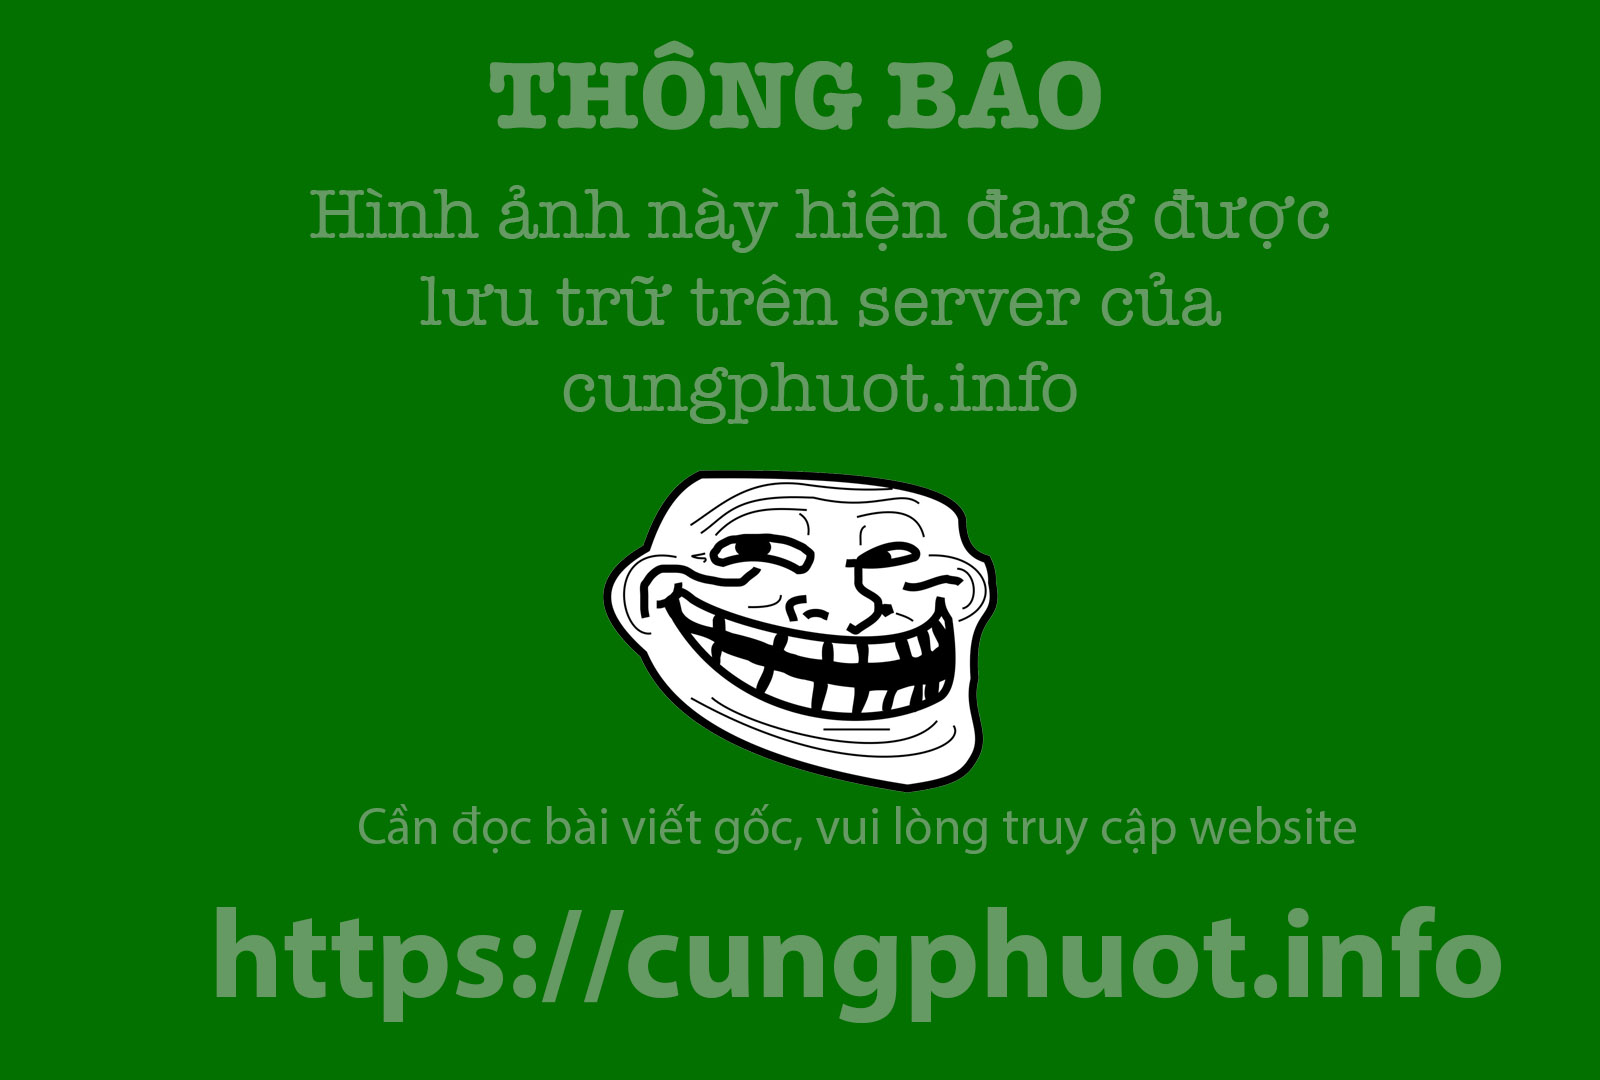 Motorcycle Rental Moc Chau